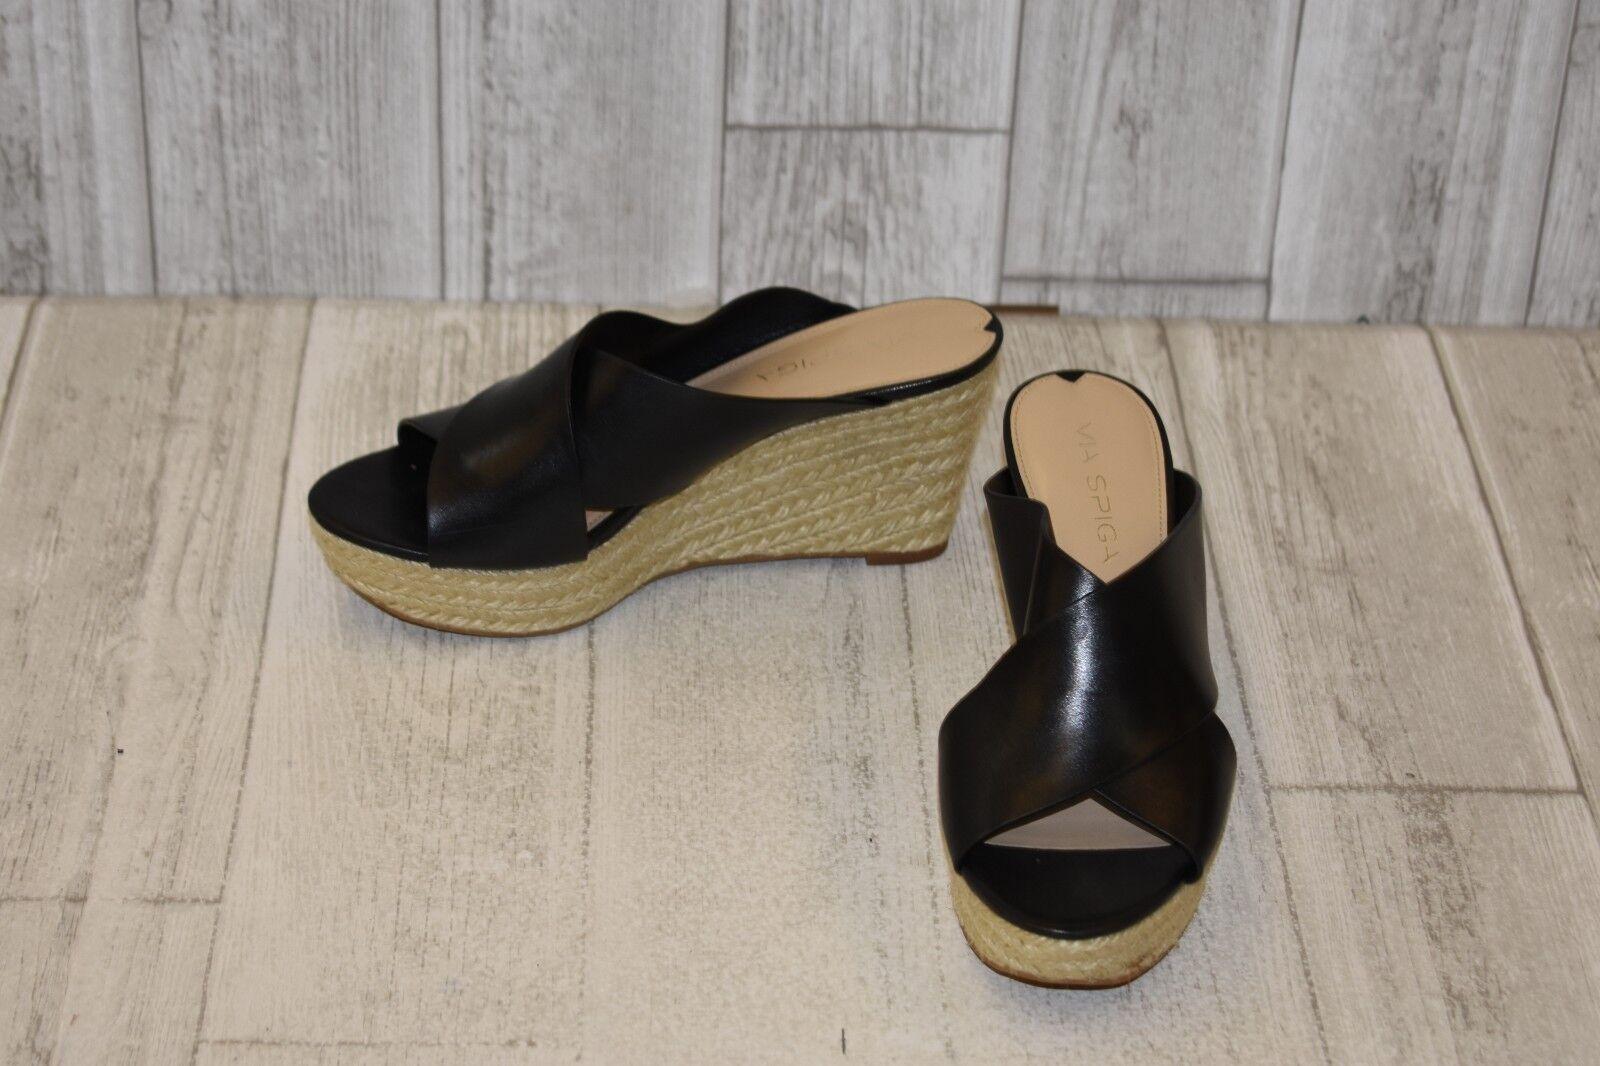 Via Spiga Leather Platform Wedge Sandals, Women's Size 6.5M, Black